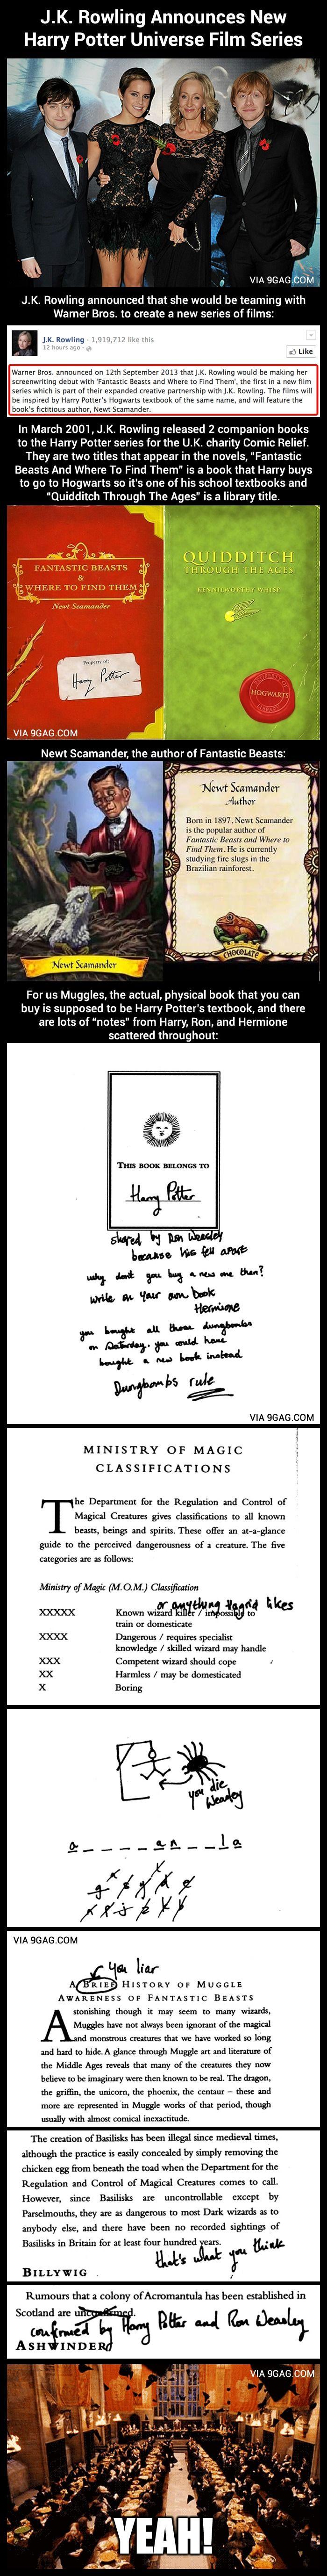 J.K. Rowling Announces New Harry Potter Universe Film Series